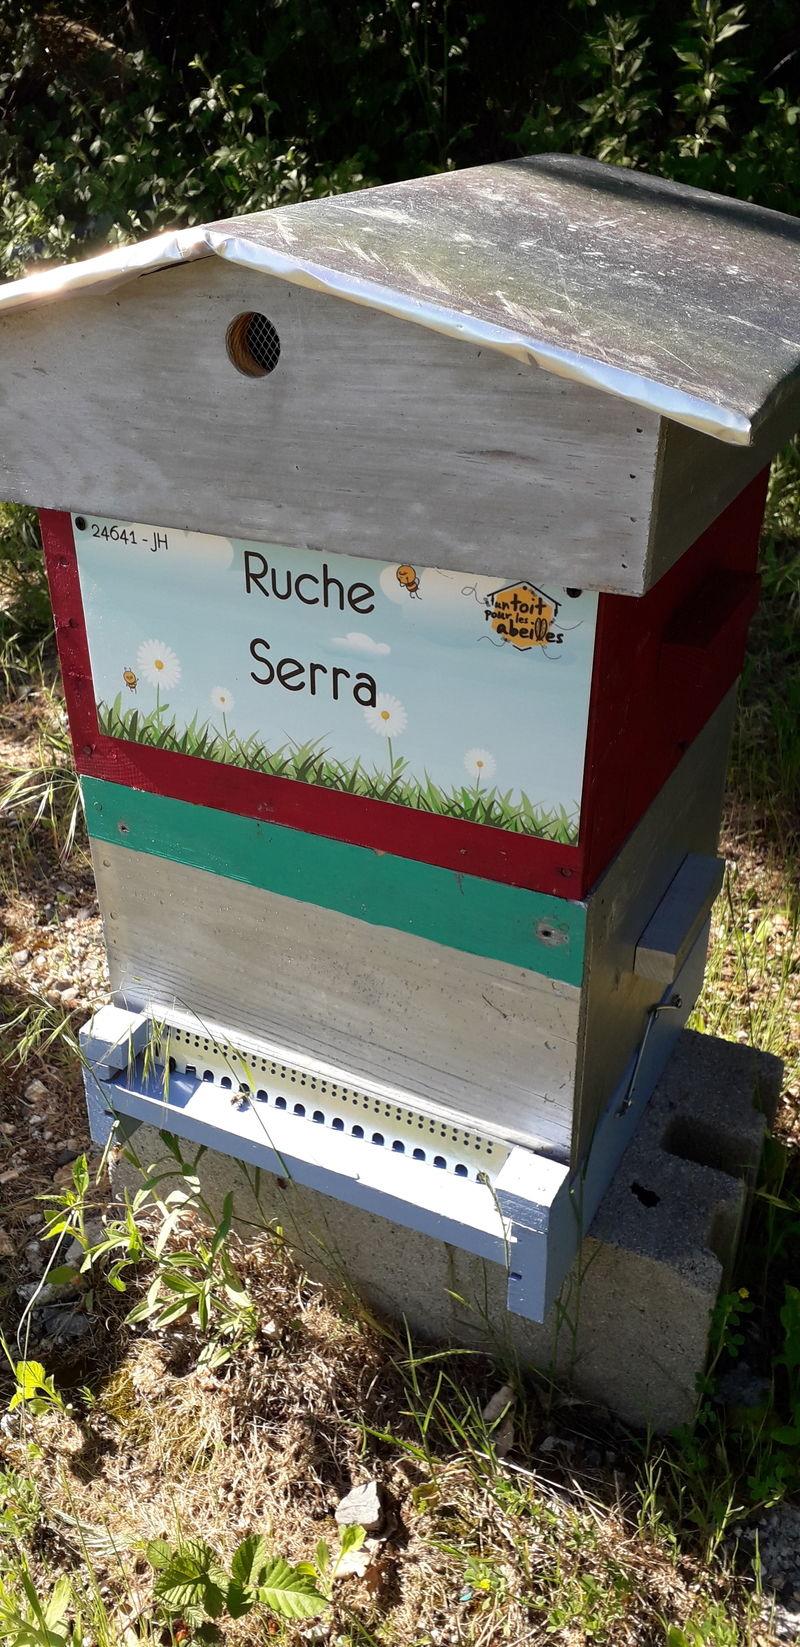 La ruche Serra